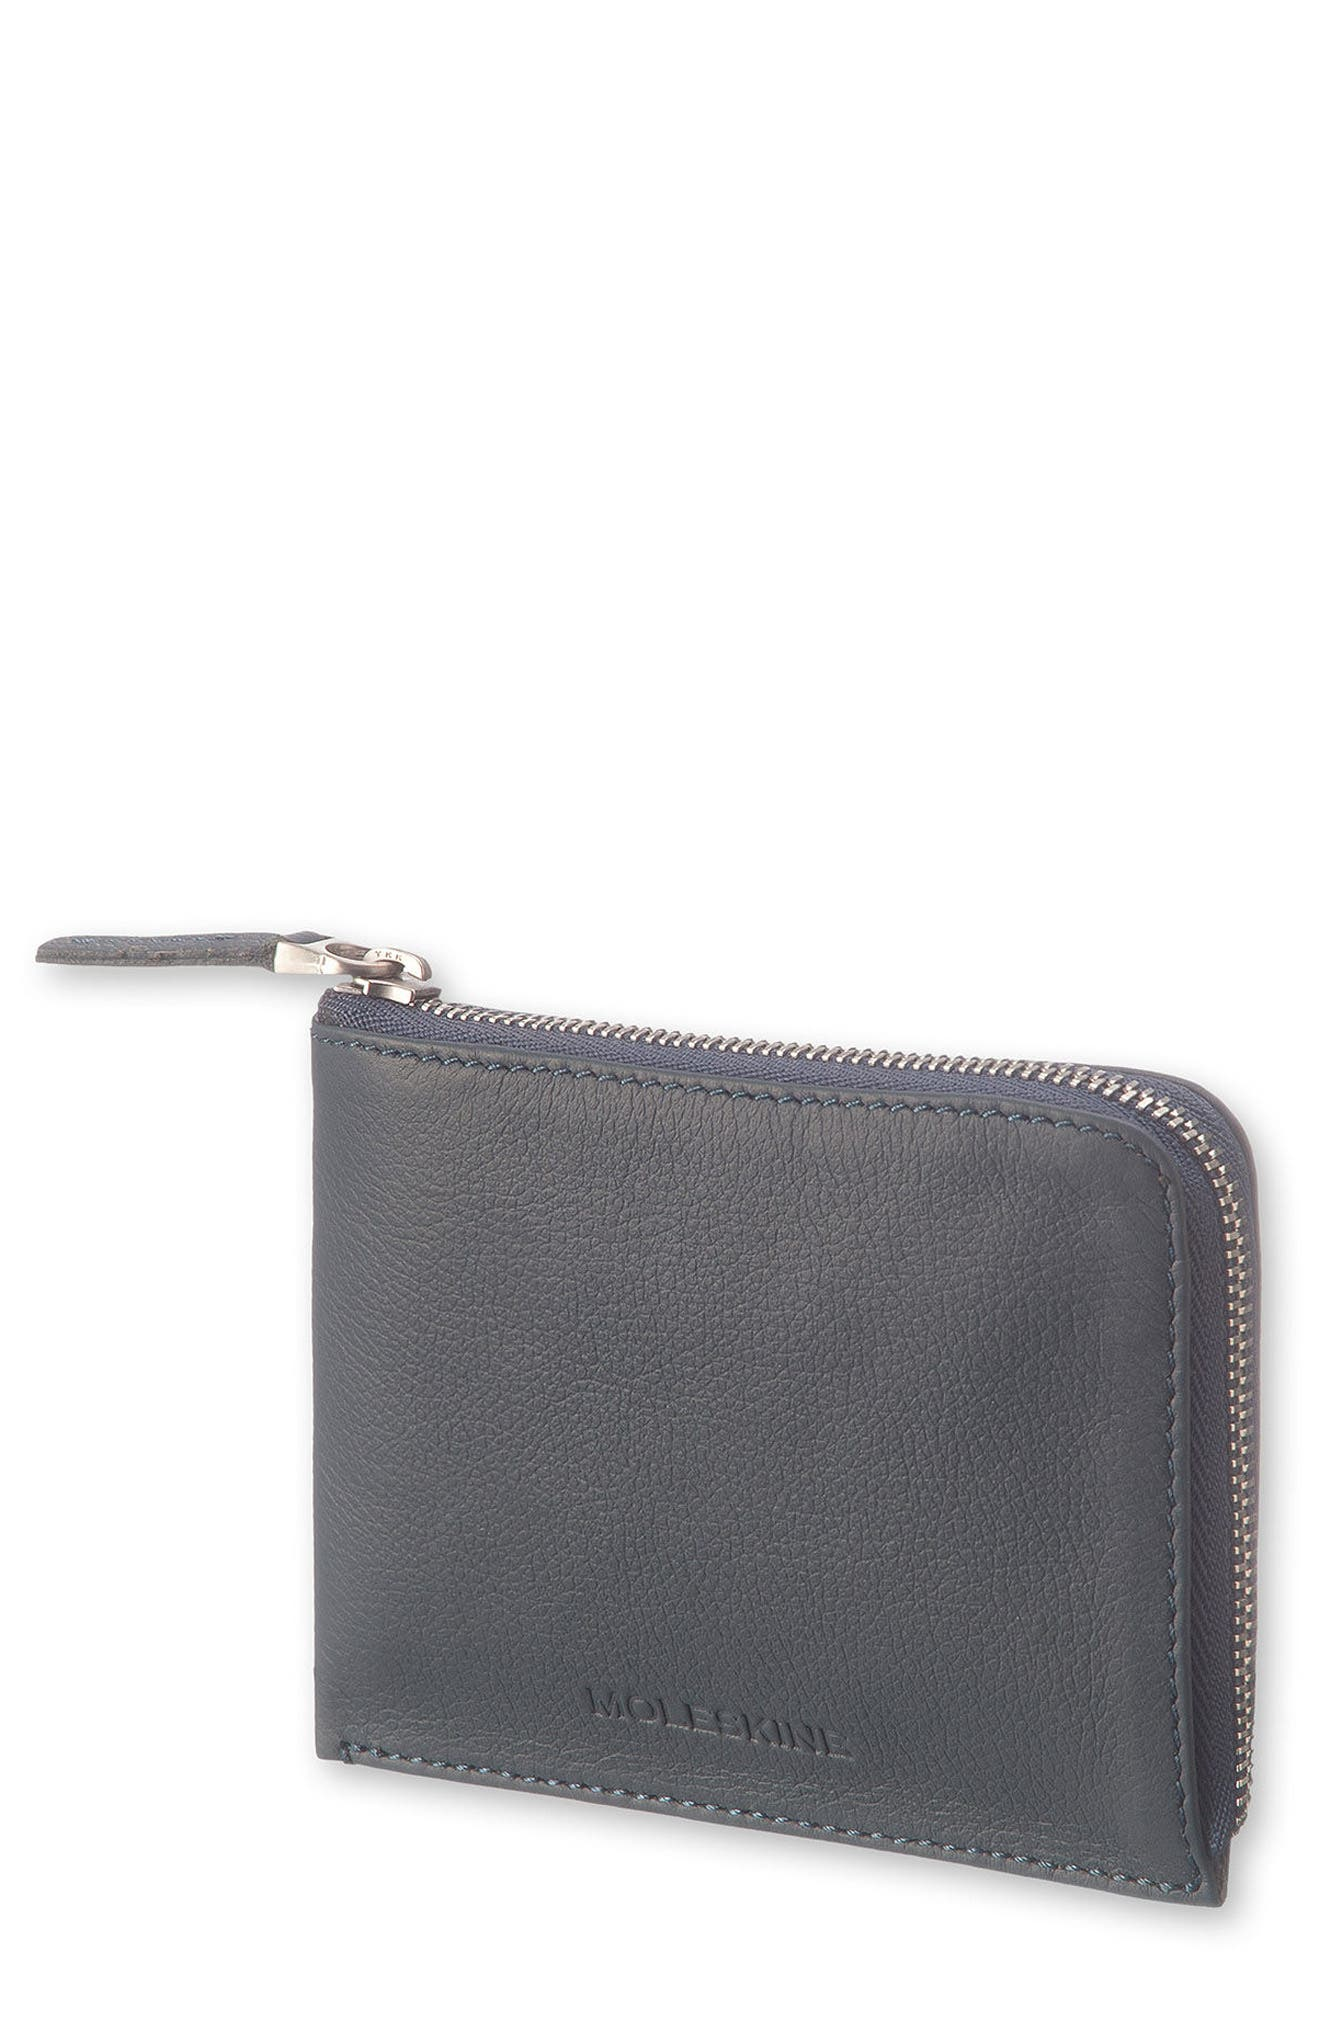 Lineage Leather Zip Wallet,                         Main,                         color, Avio Blue